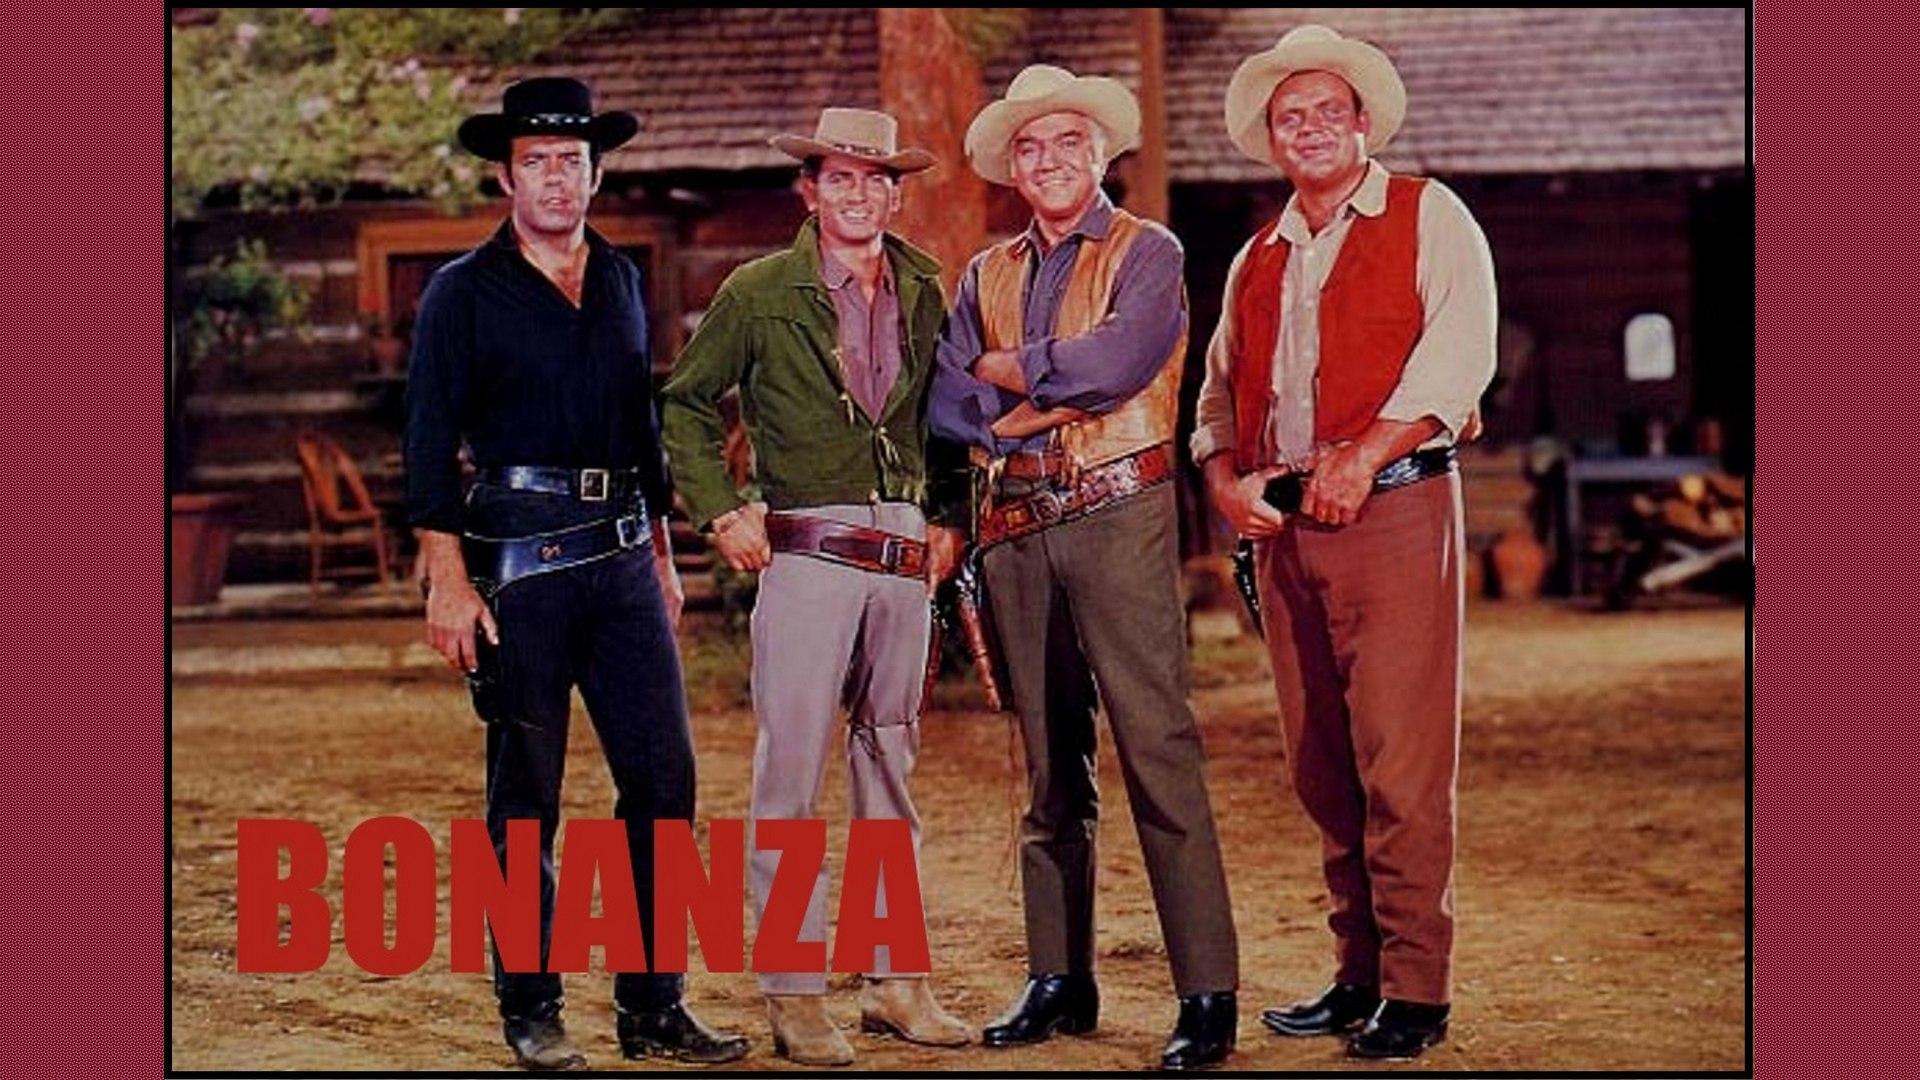 Bonanza-Dark Star- Free Classic Western Movies and TV Shows-Retro TV